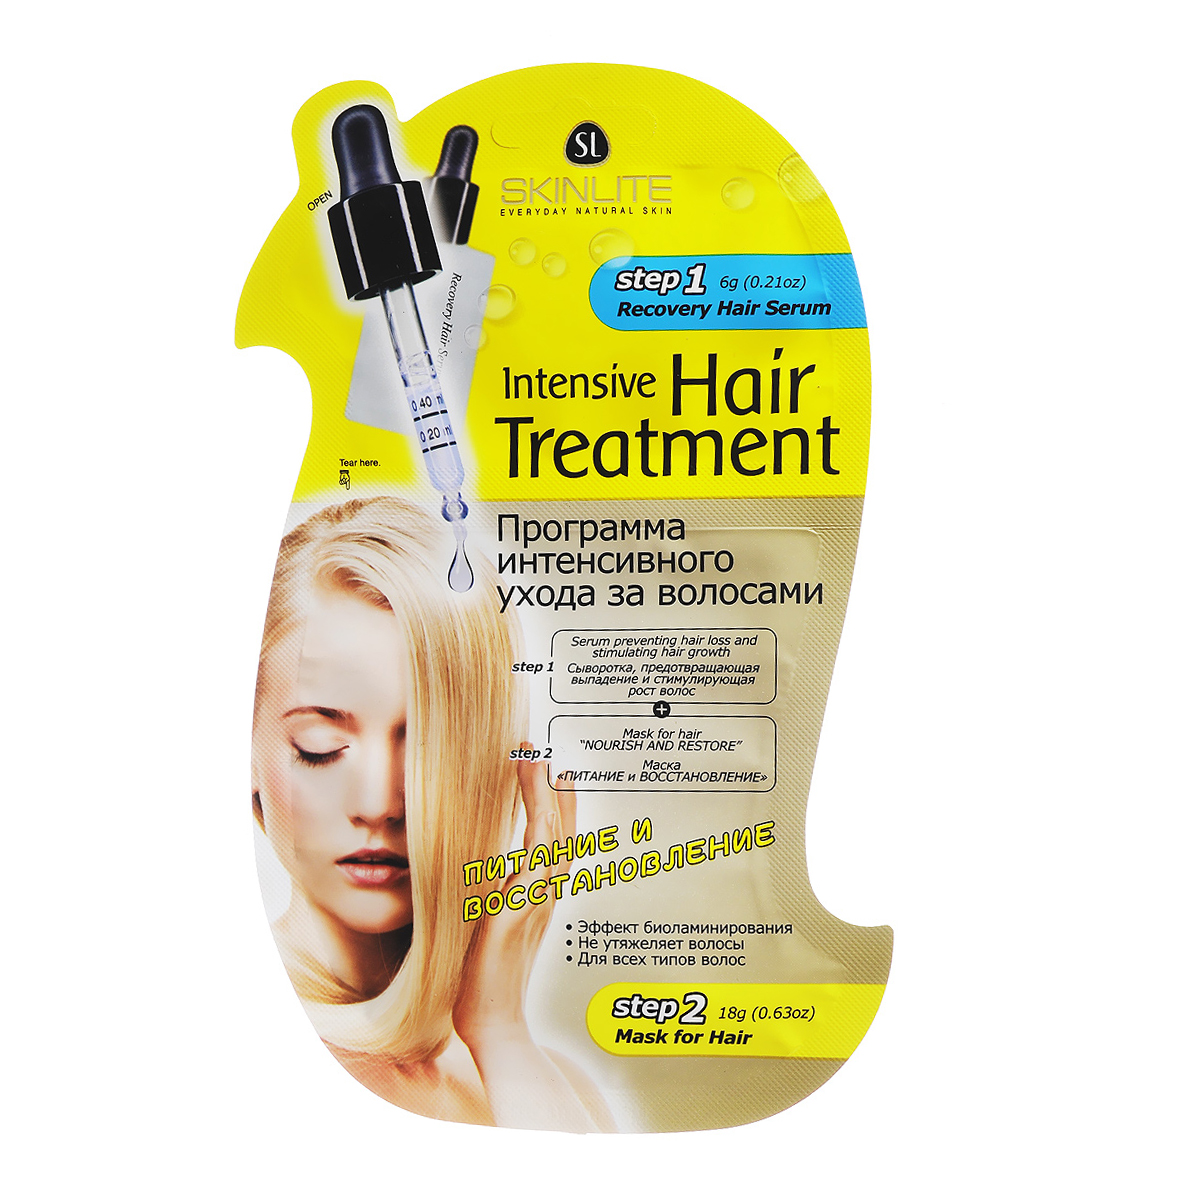 Skinlite Программа интенсивного ухода за волосами Питание и восстановление